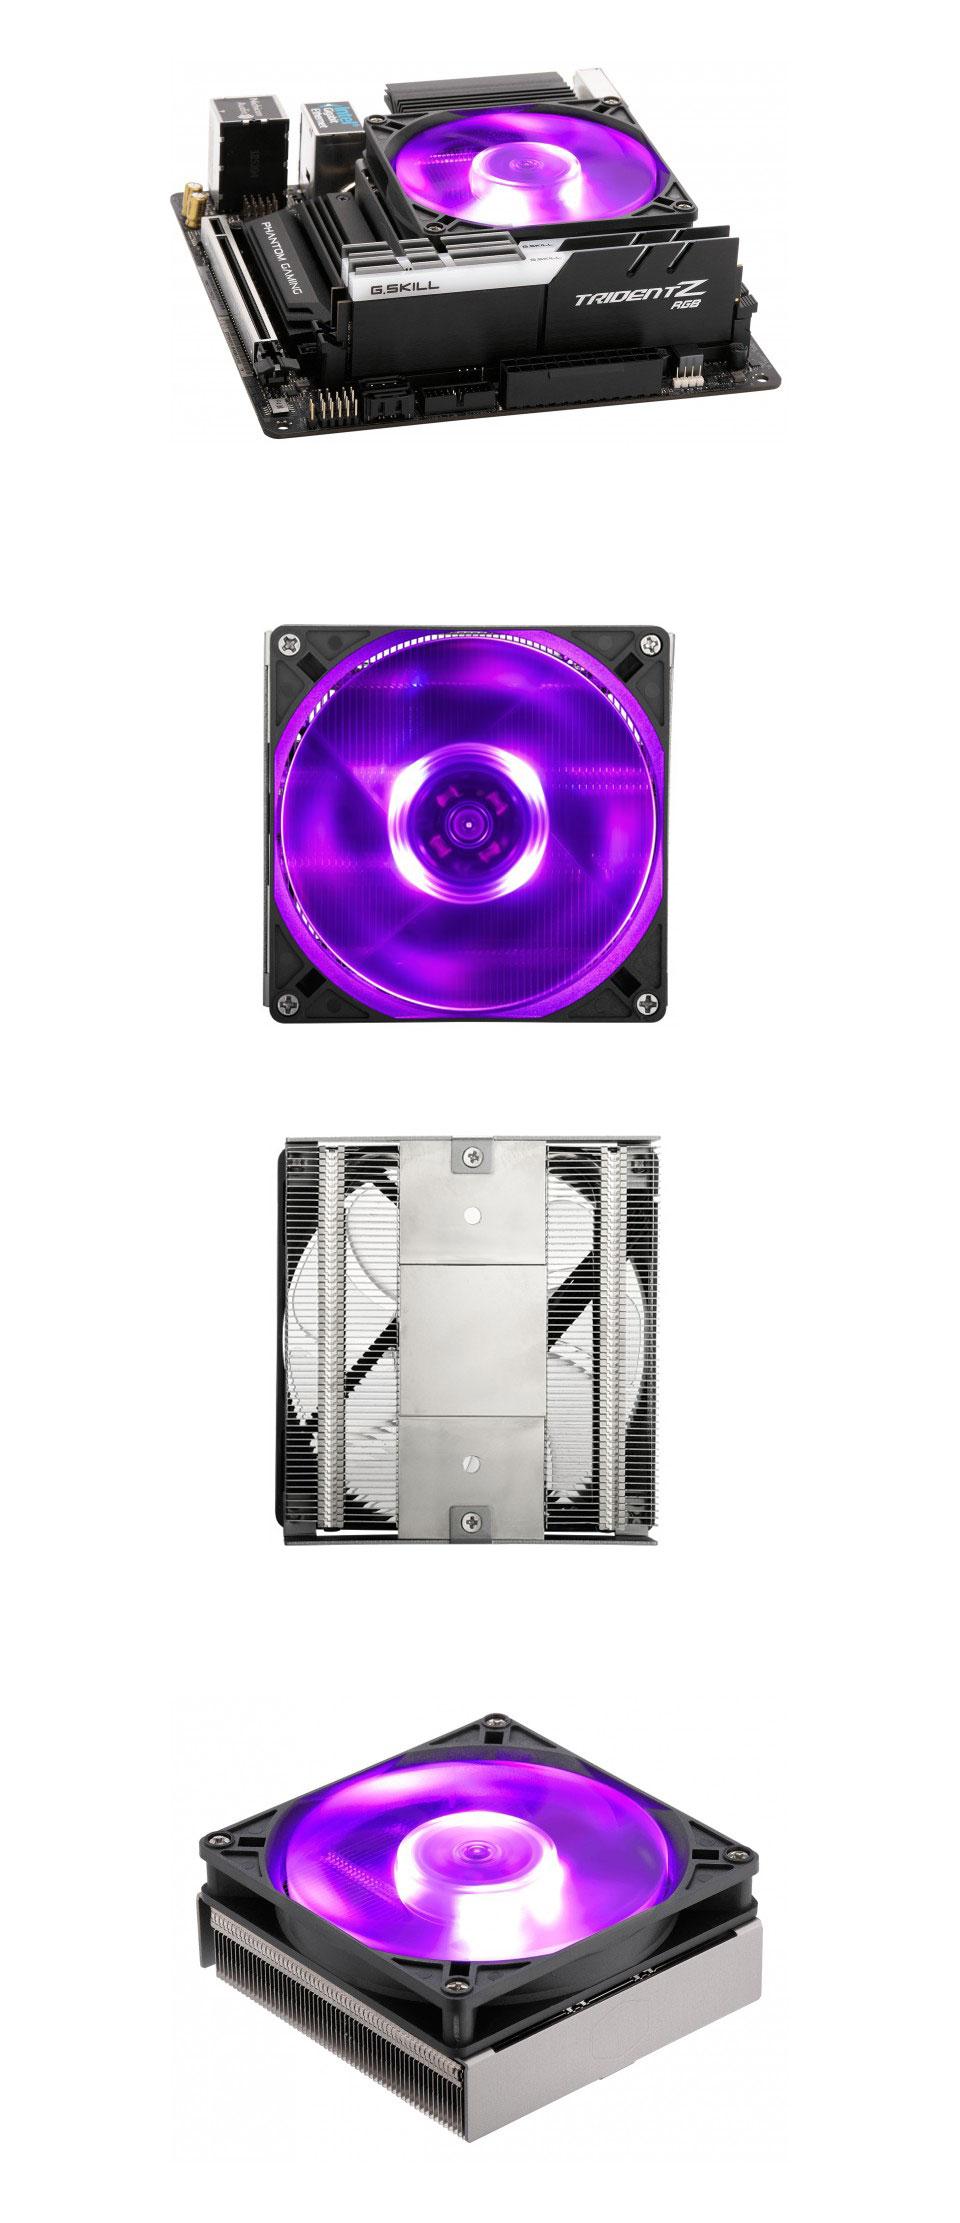 Cooler Master MasterAir G200P RGB Low Profile CPU Cooler product